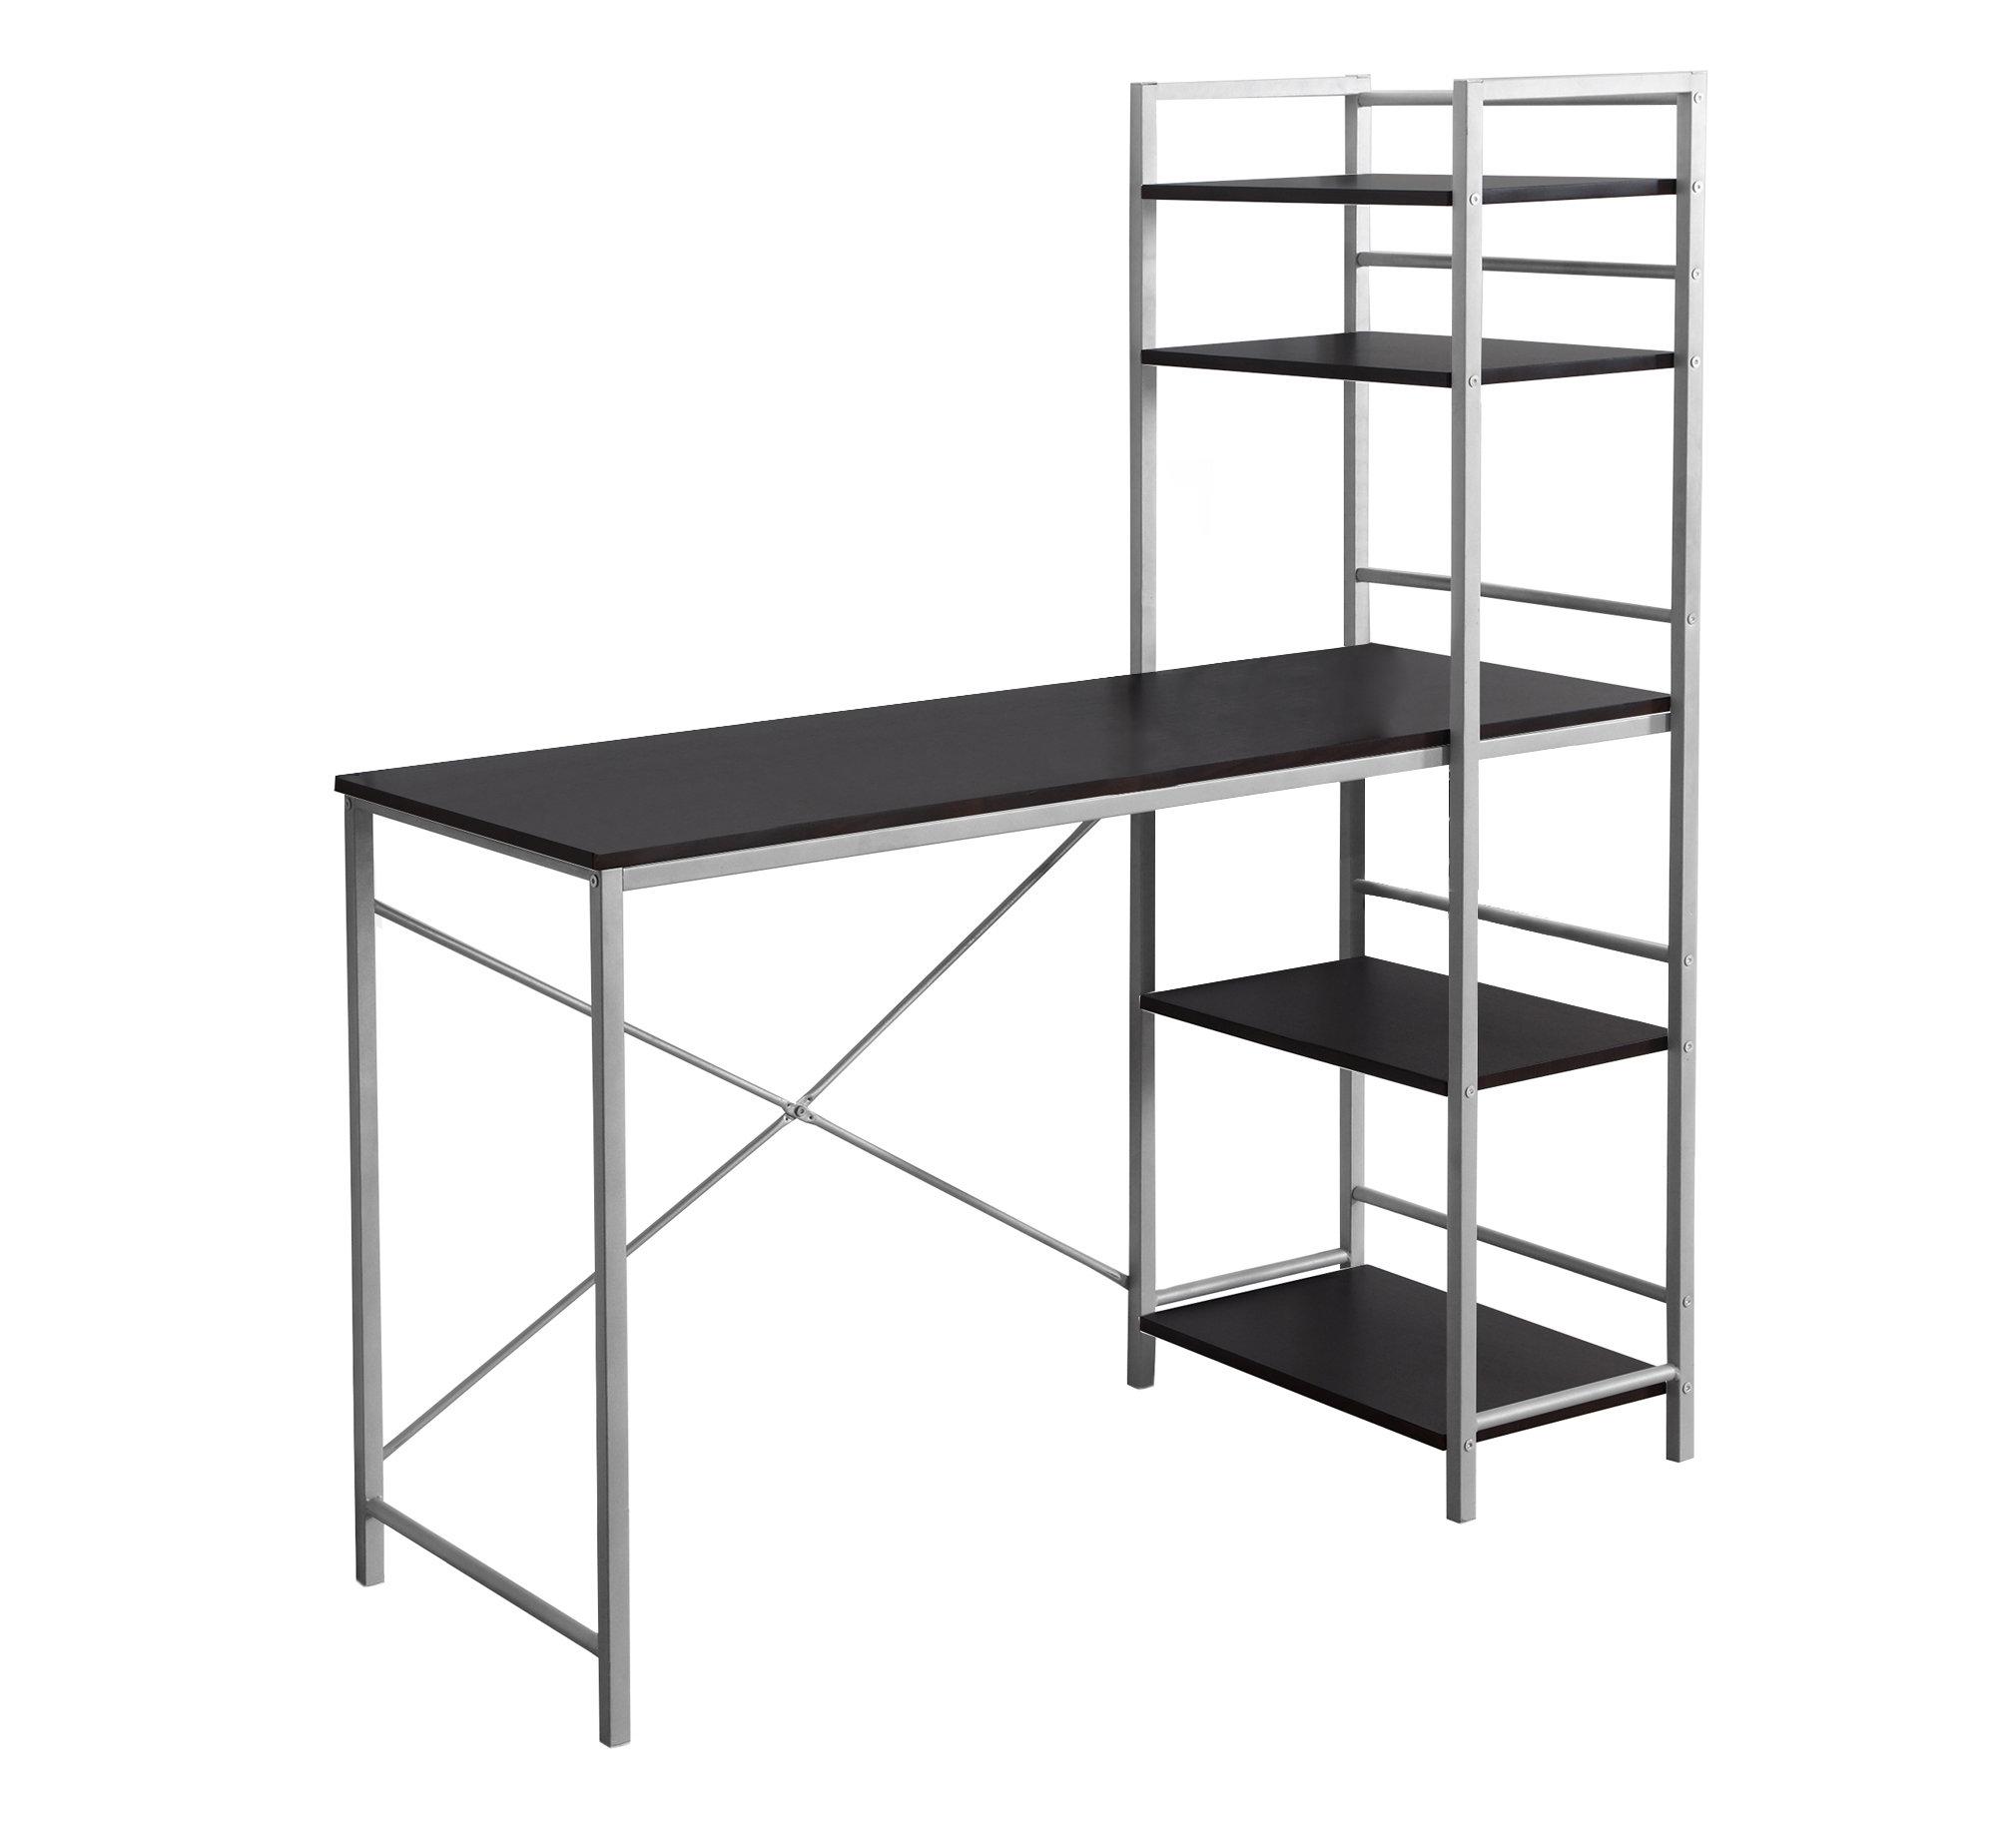 "18.5"" x 47.25"" x 55"" Cappuccino Silver Mdf Metal  Computer Desk"